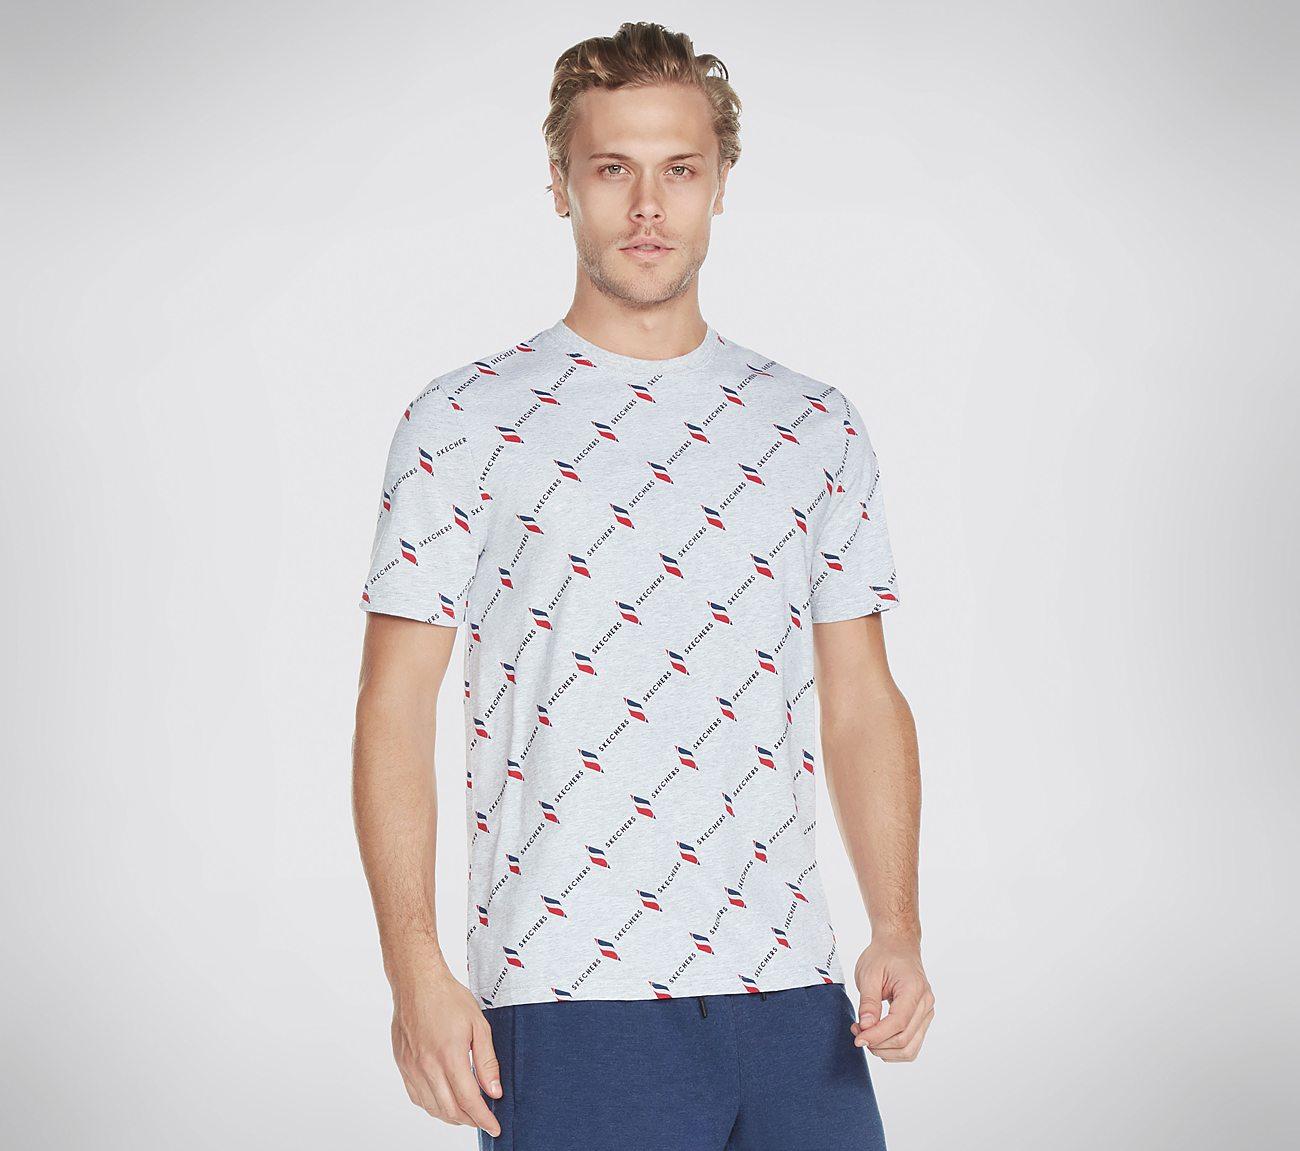 Skechers Apparel Logo Print Tee Shirt